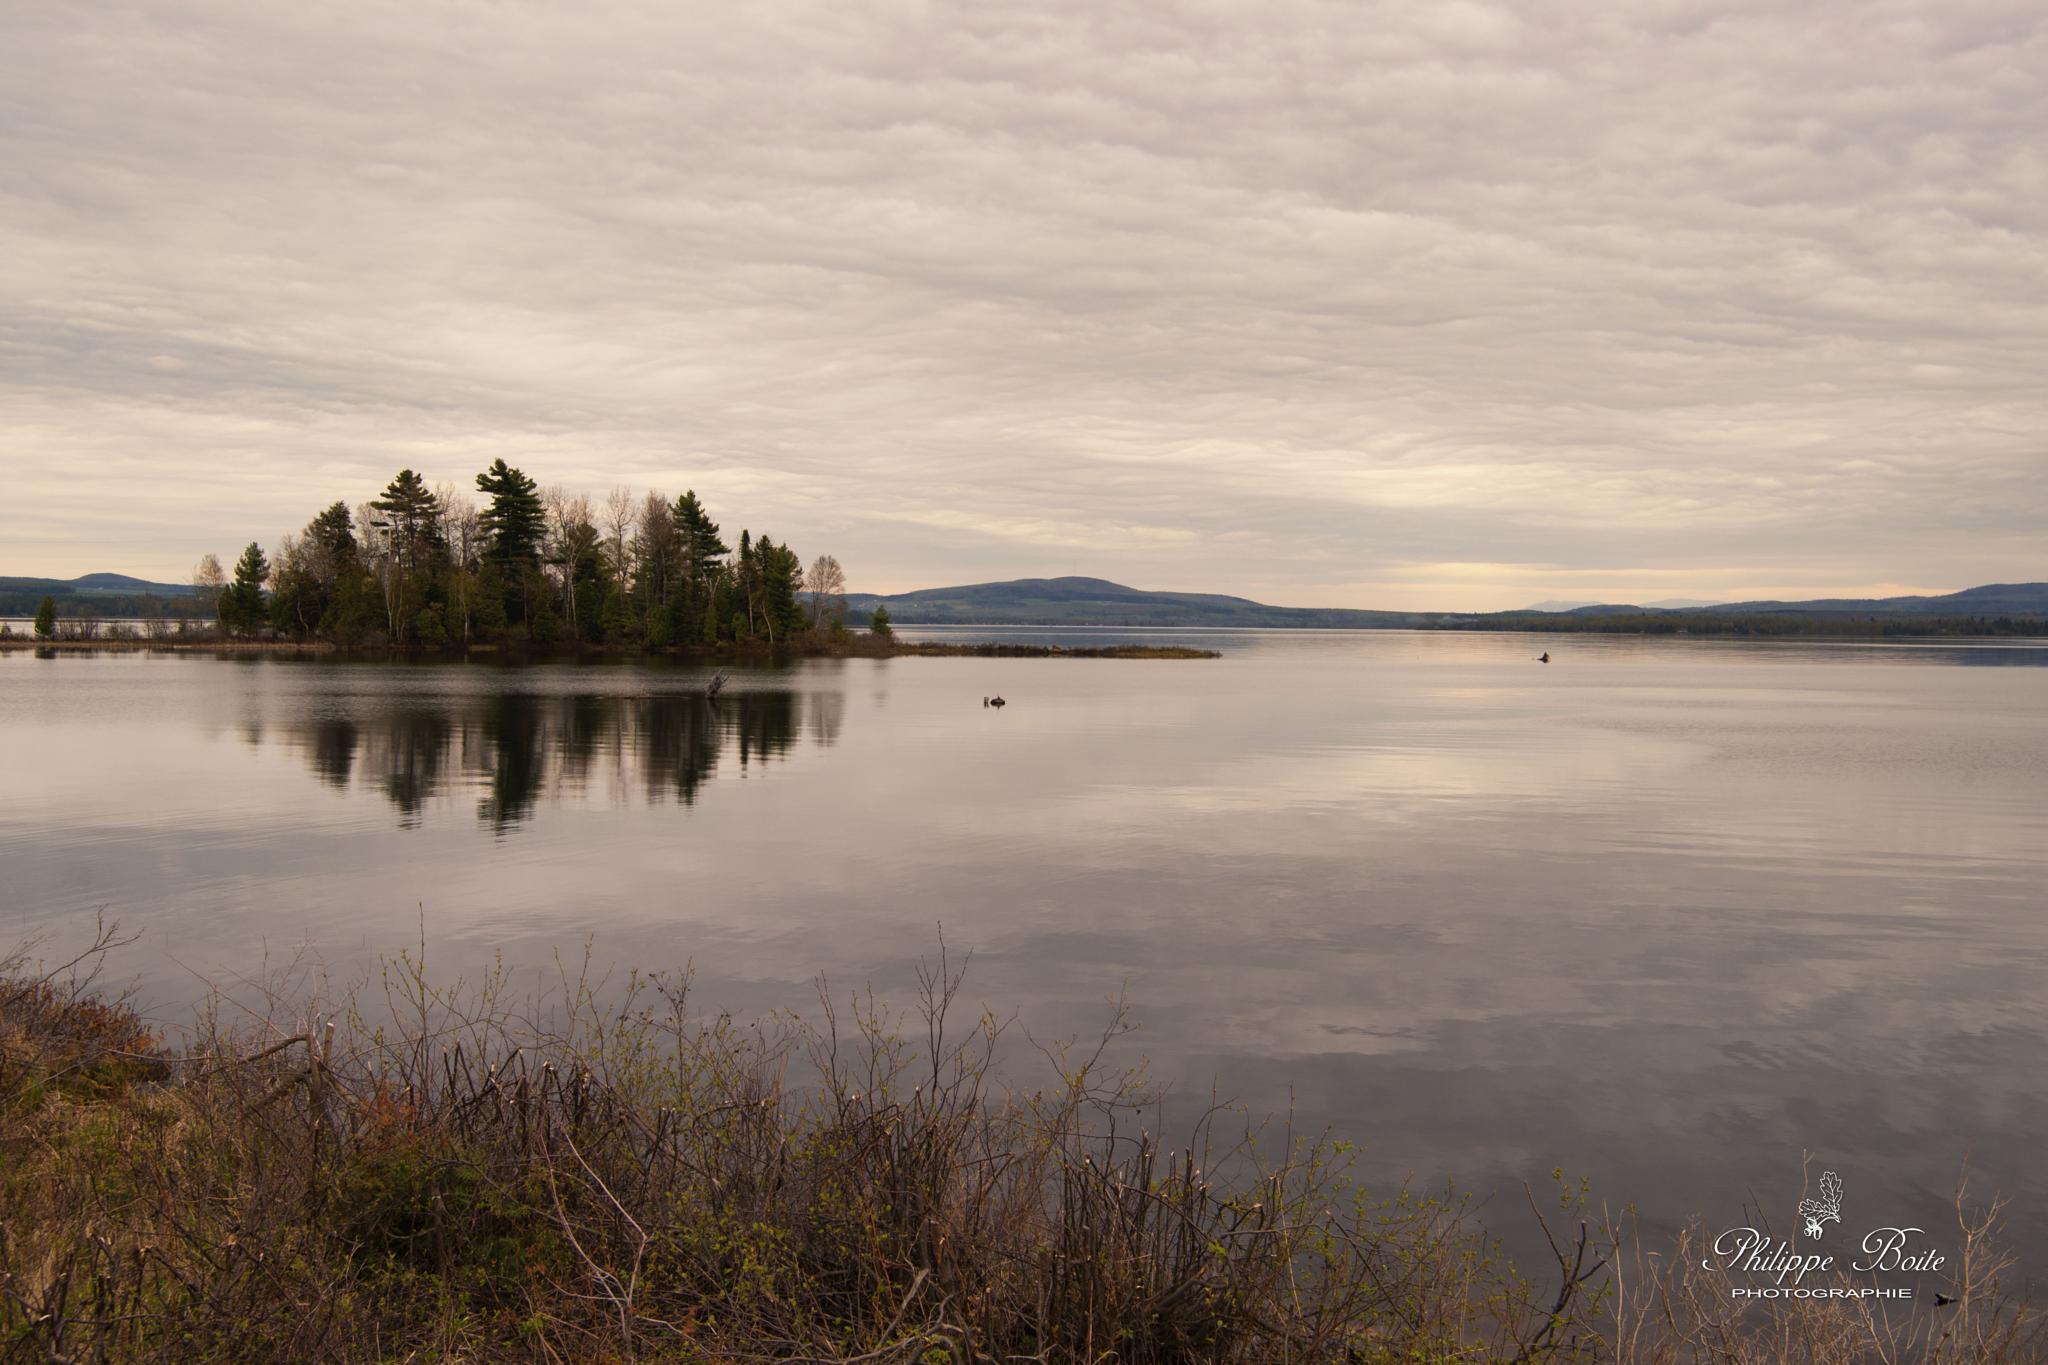 Lake Aylmer by Philippe Boite